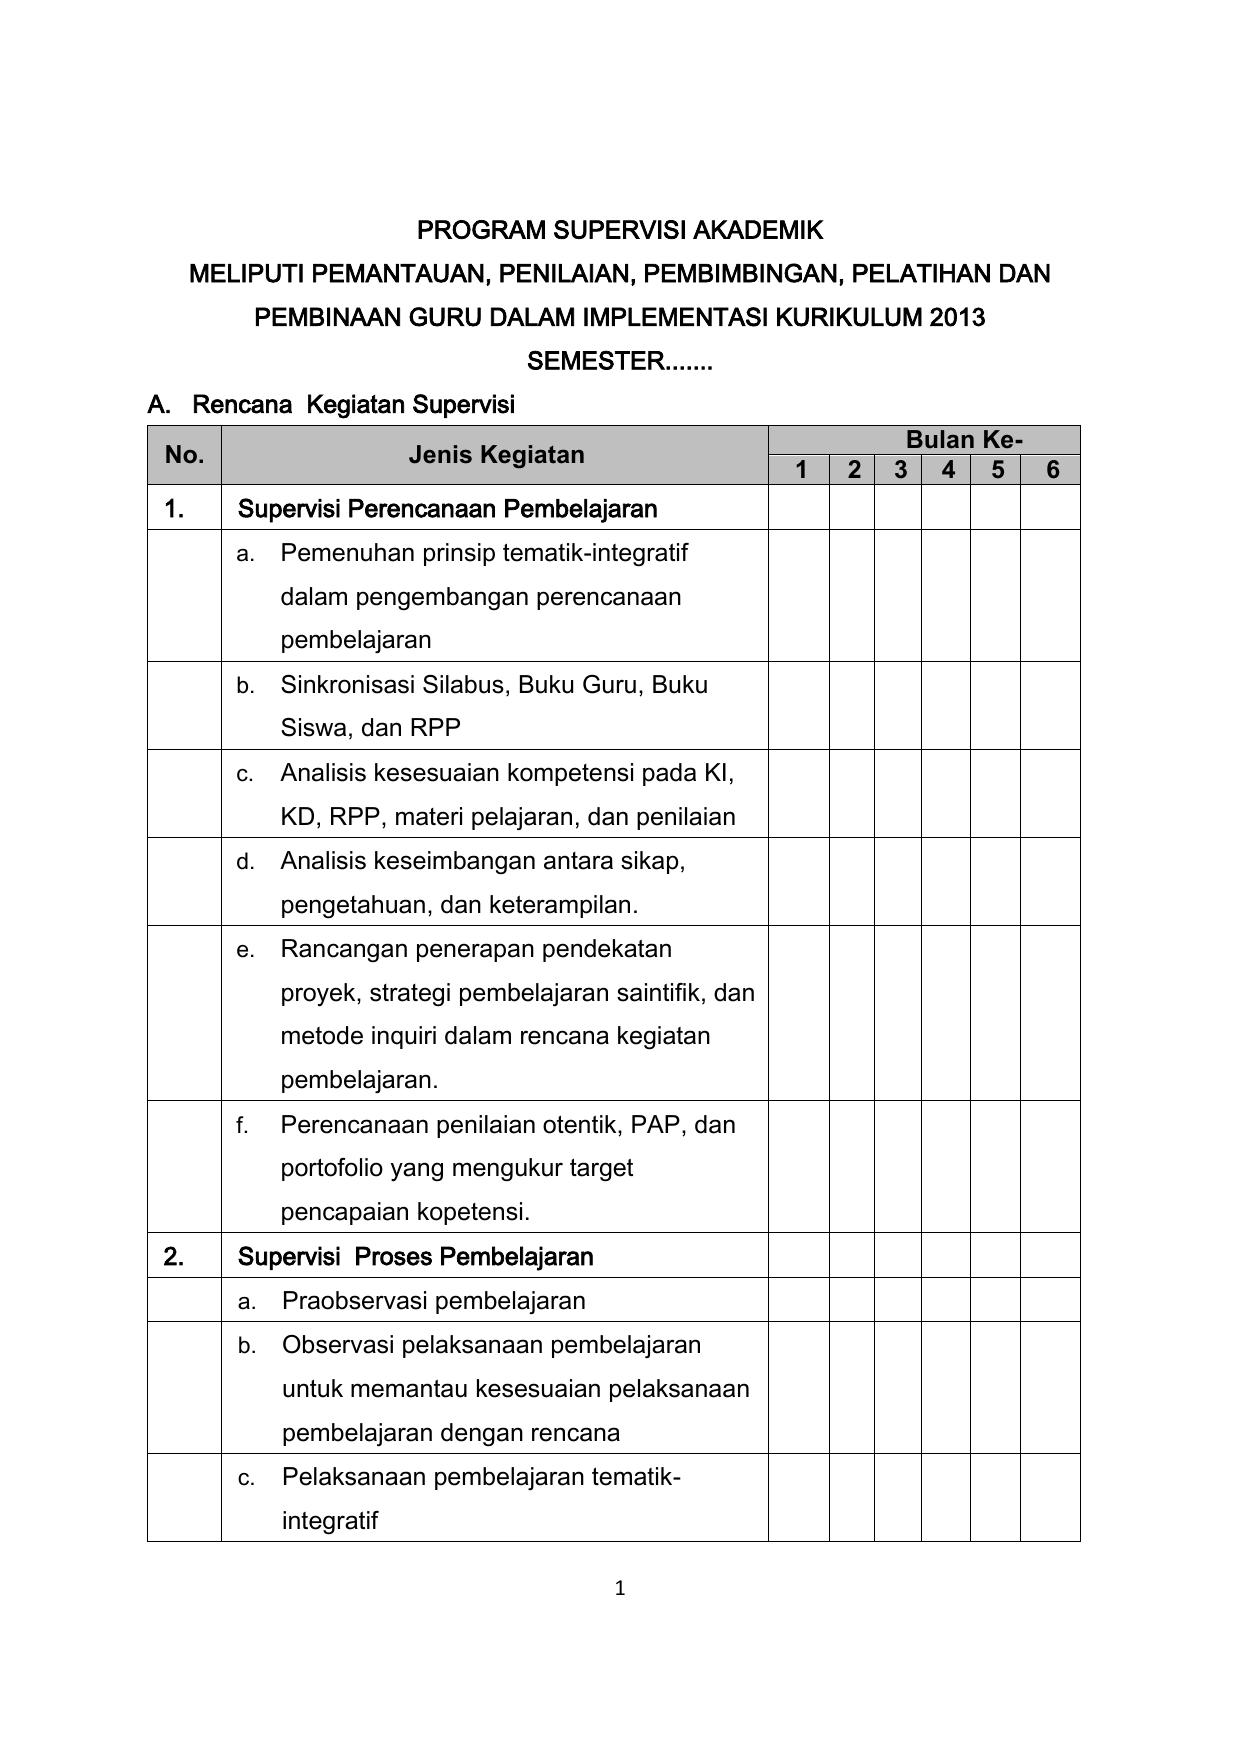 Instrumen Supervisi Akademik Kurikulum 2013 Doc : instrumen, supervisi, akademik, kurikulum, PROGRAM, SUPERVISI, AKADEMIK, MELIPUTI, PEMANTAUAN